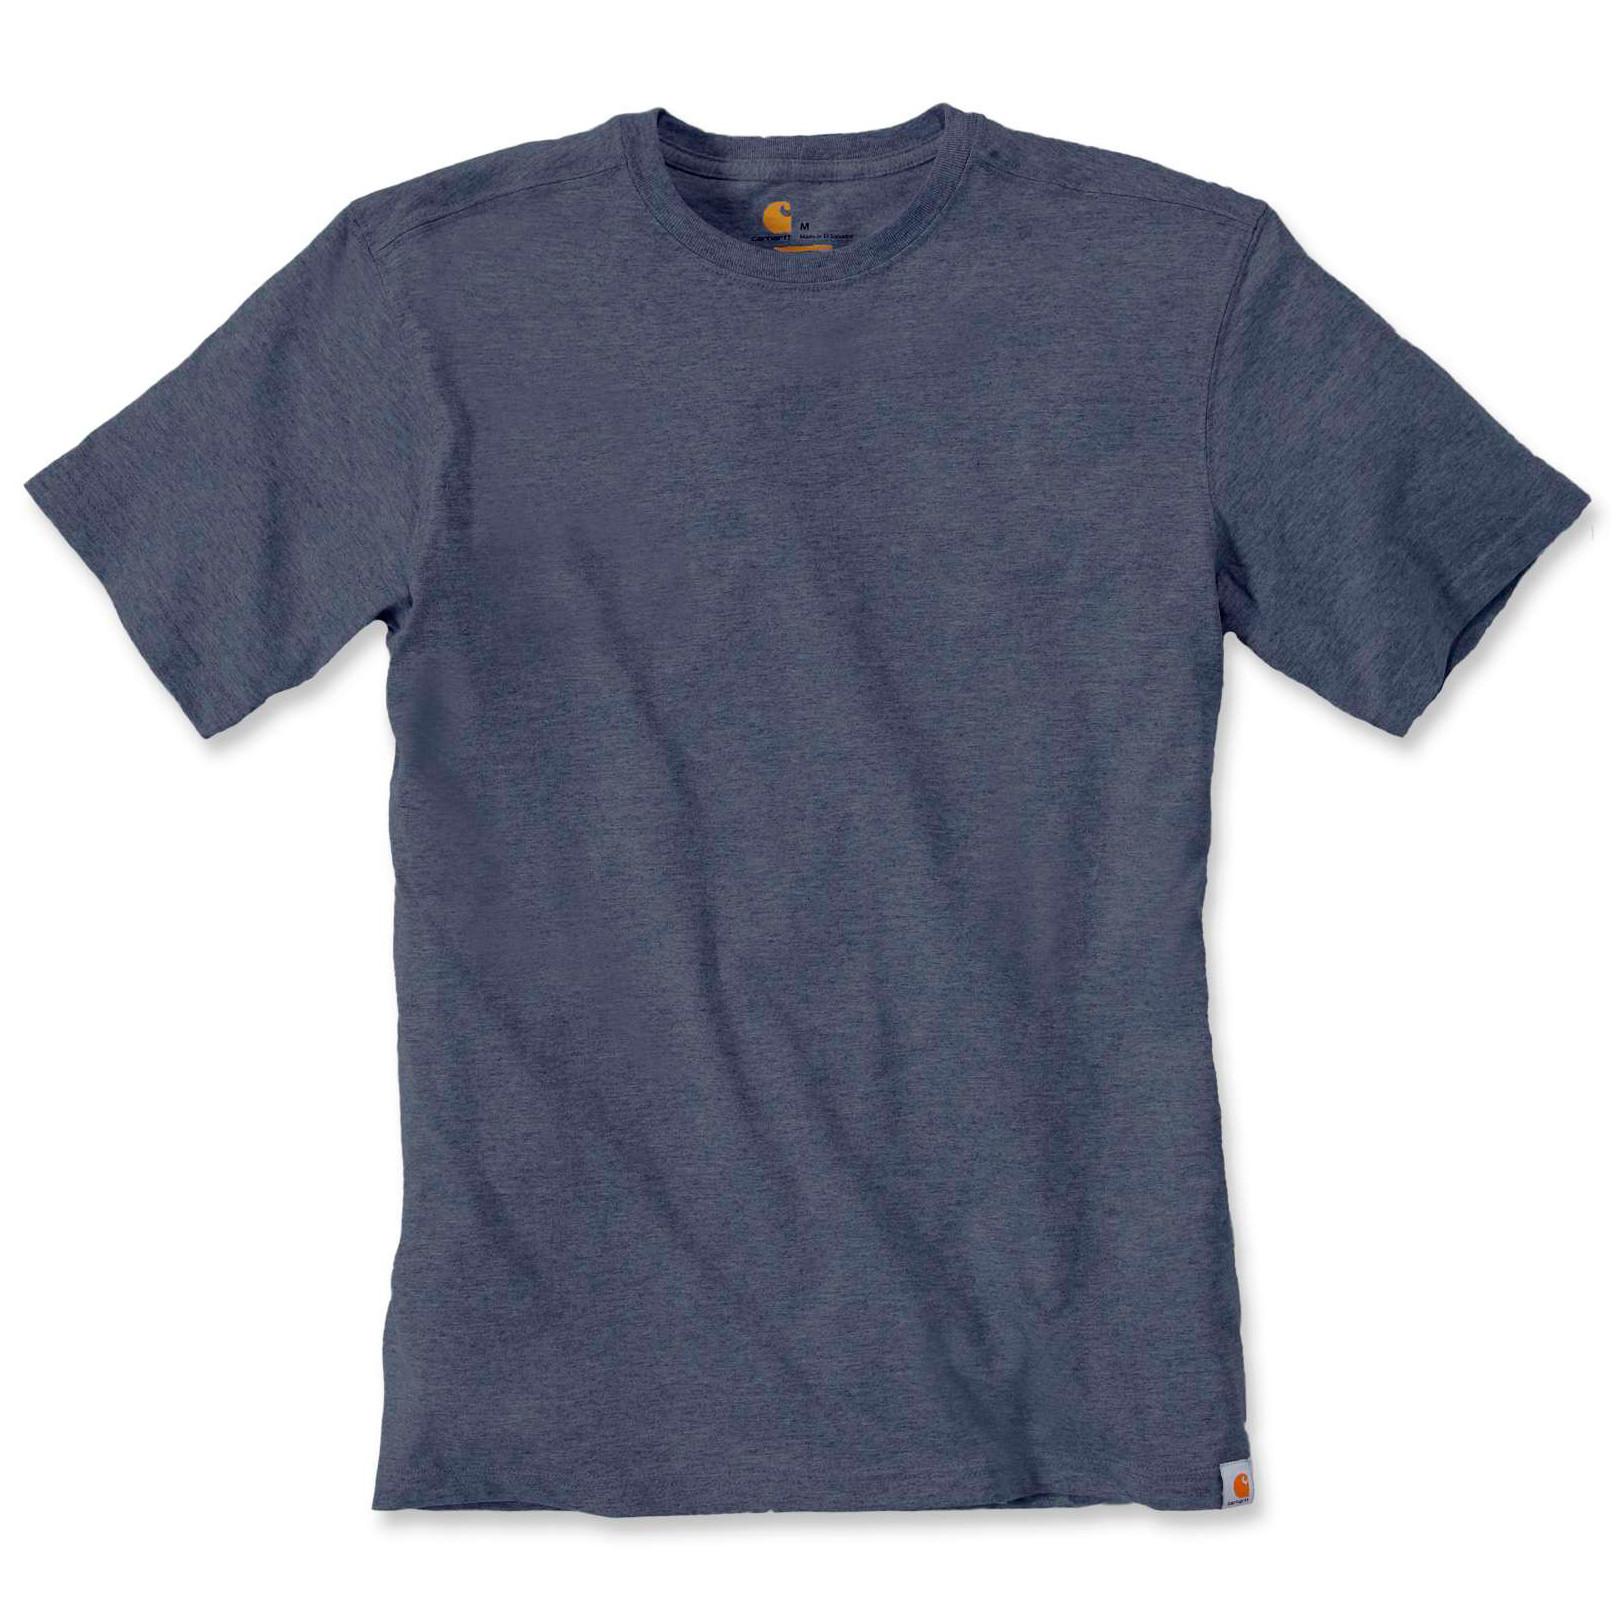 Футболка Carhartt Maddock T-Shirt S/S - 101124 (Indigo Heather, XS)